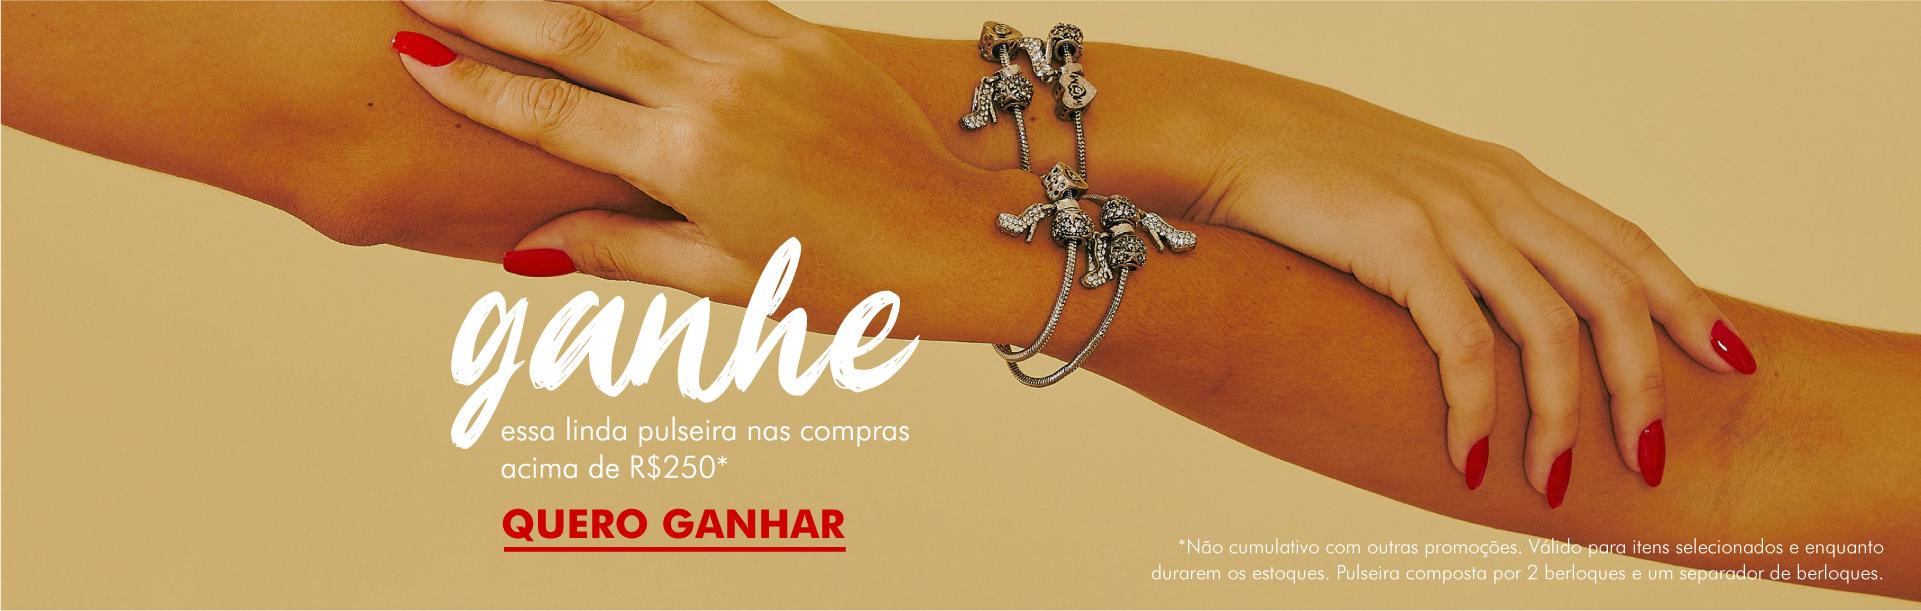 Banner: pulseira + amarra & tinge